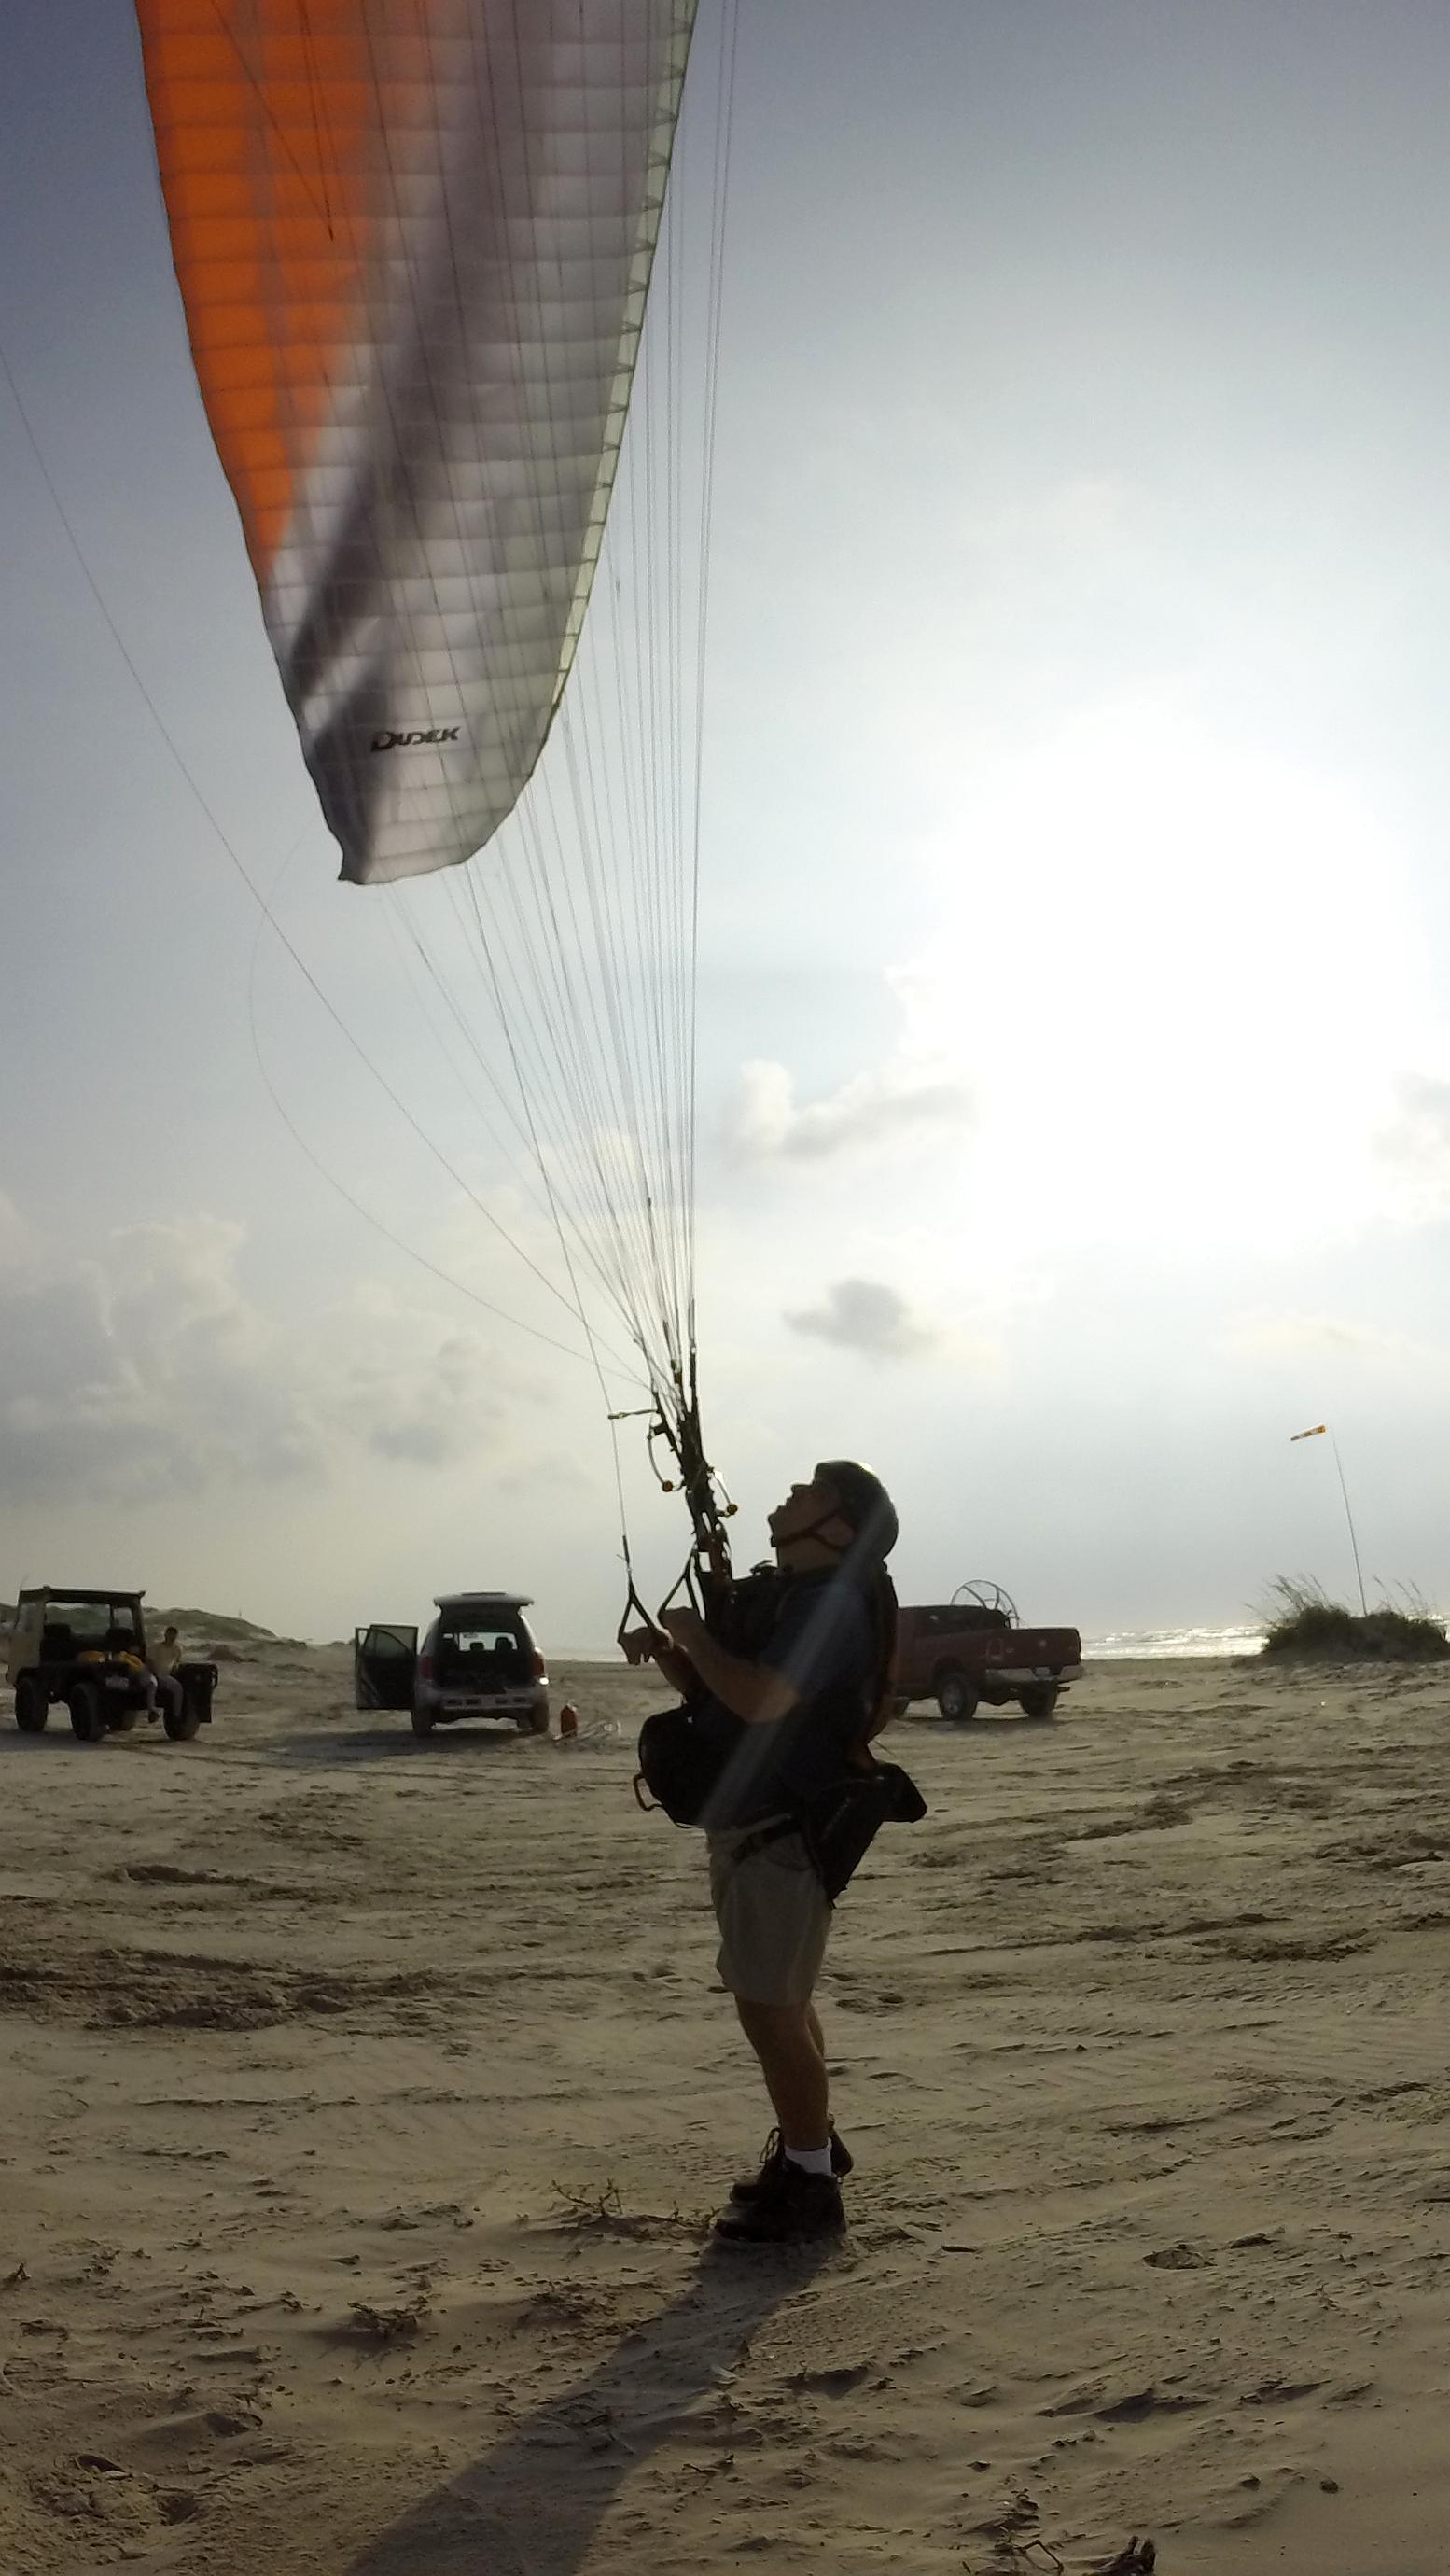 Kiting Practice